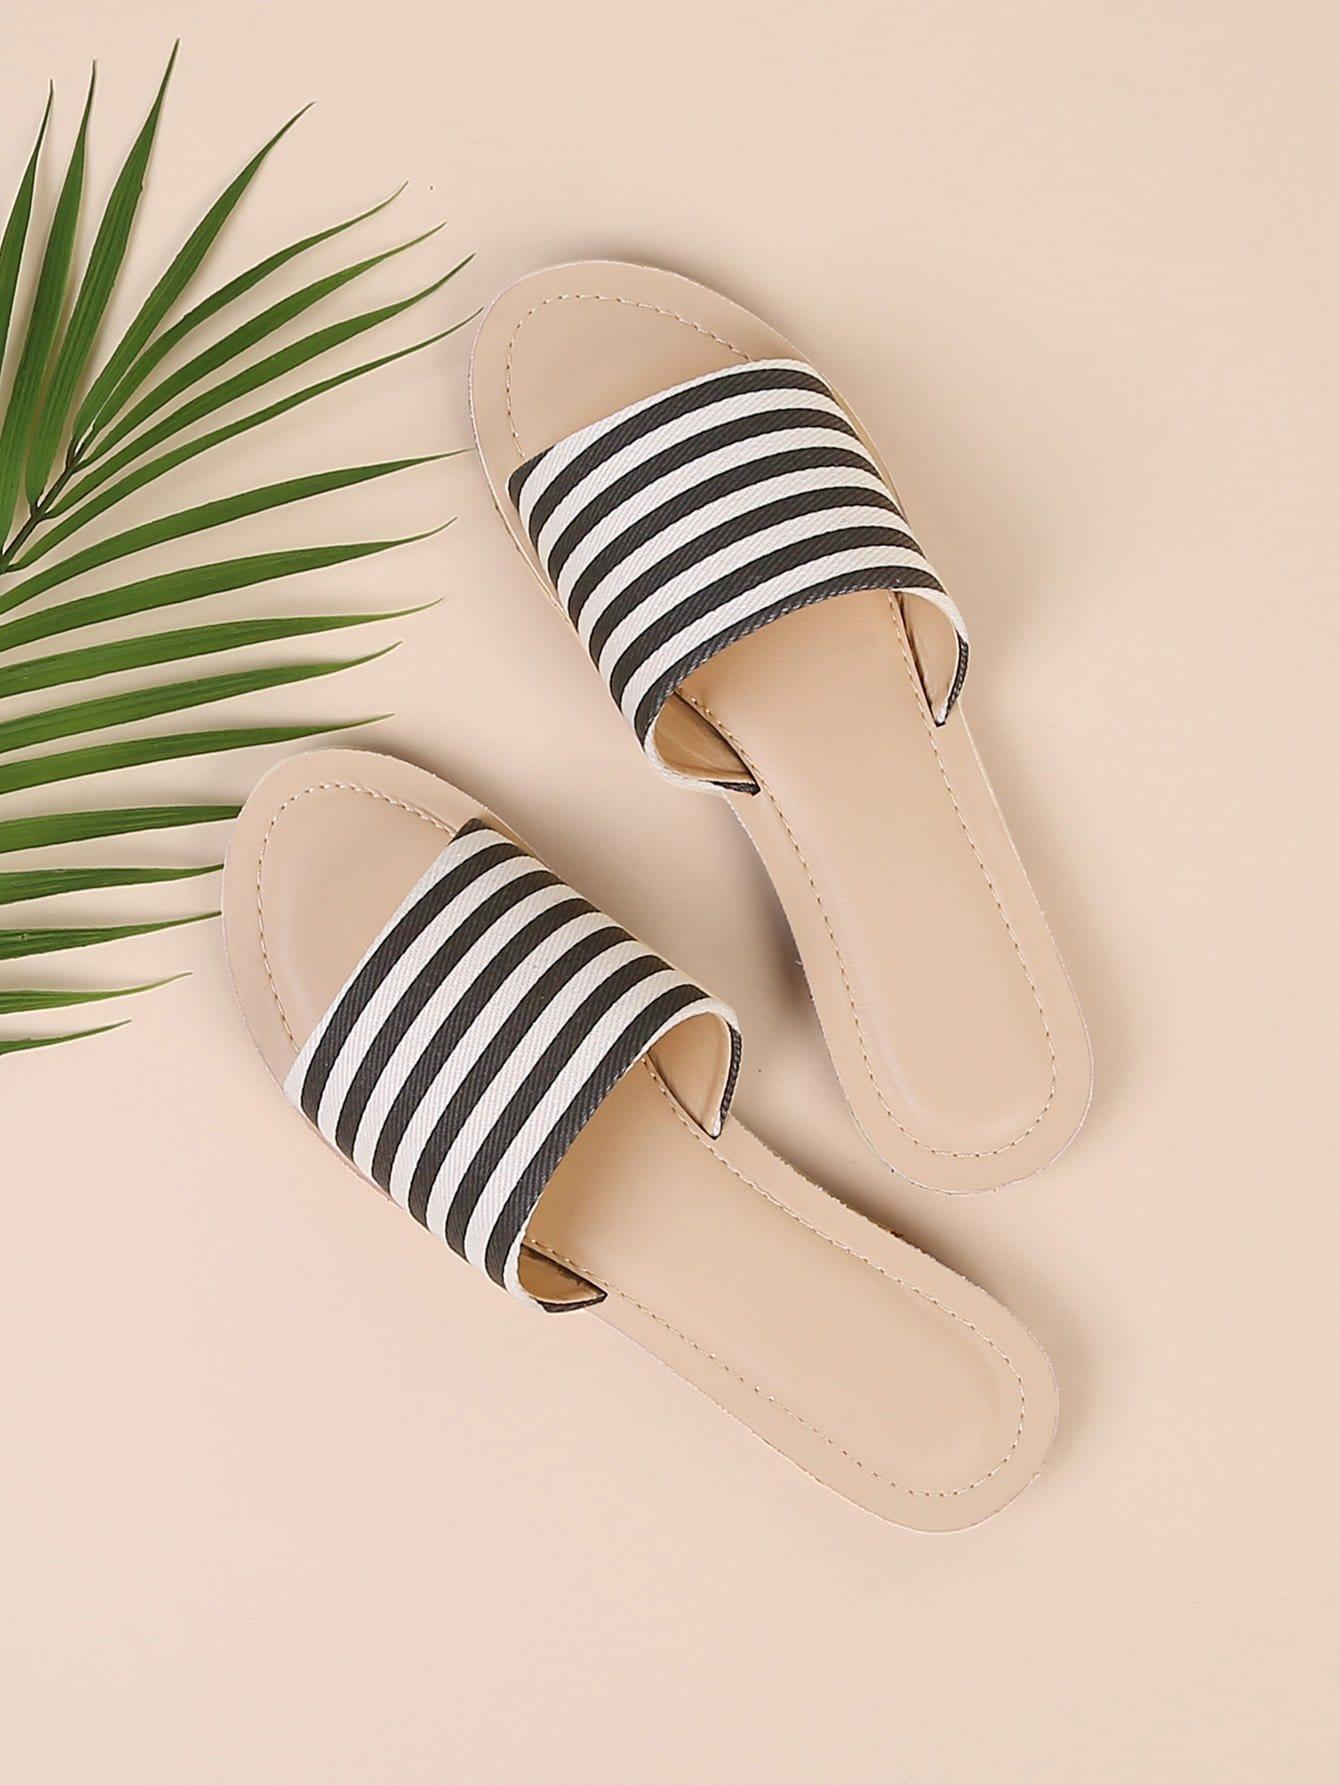 Striped Design Flat Slippers шланг walcom 60328